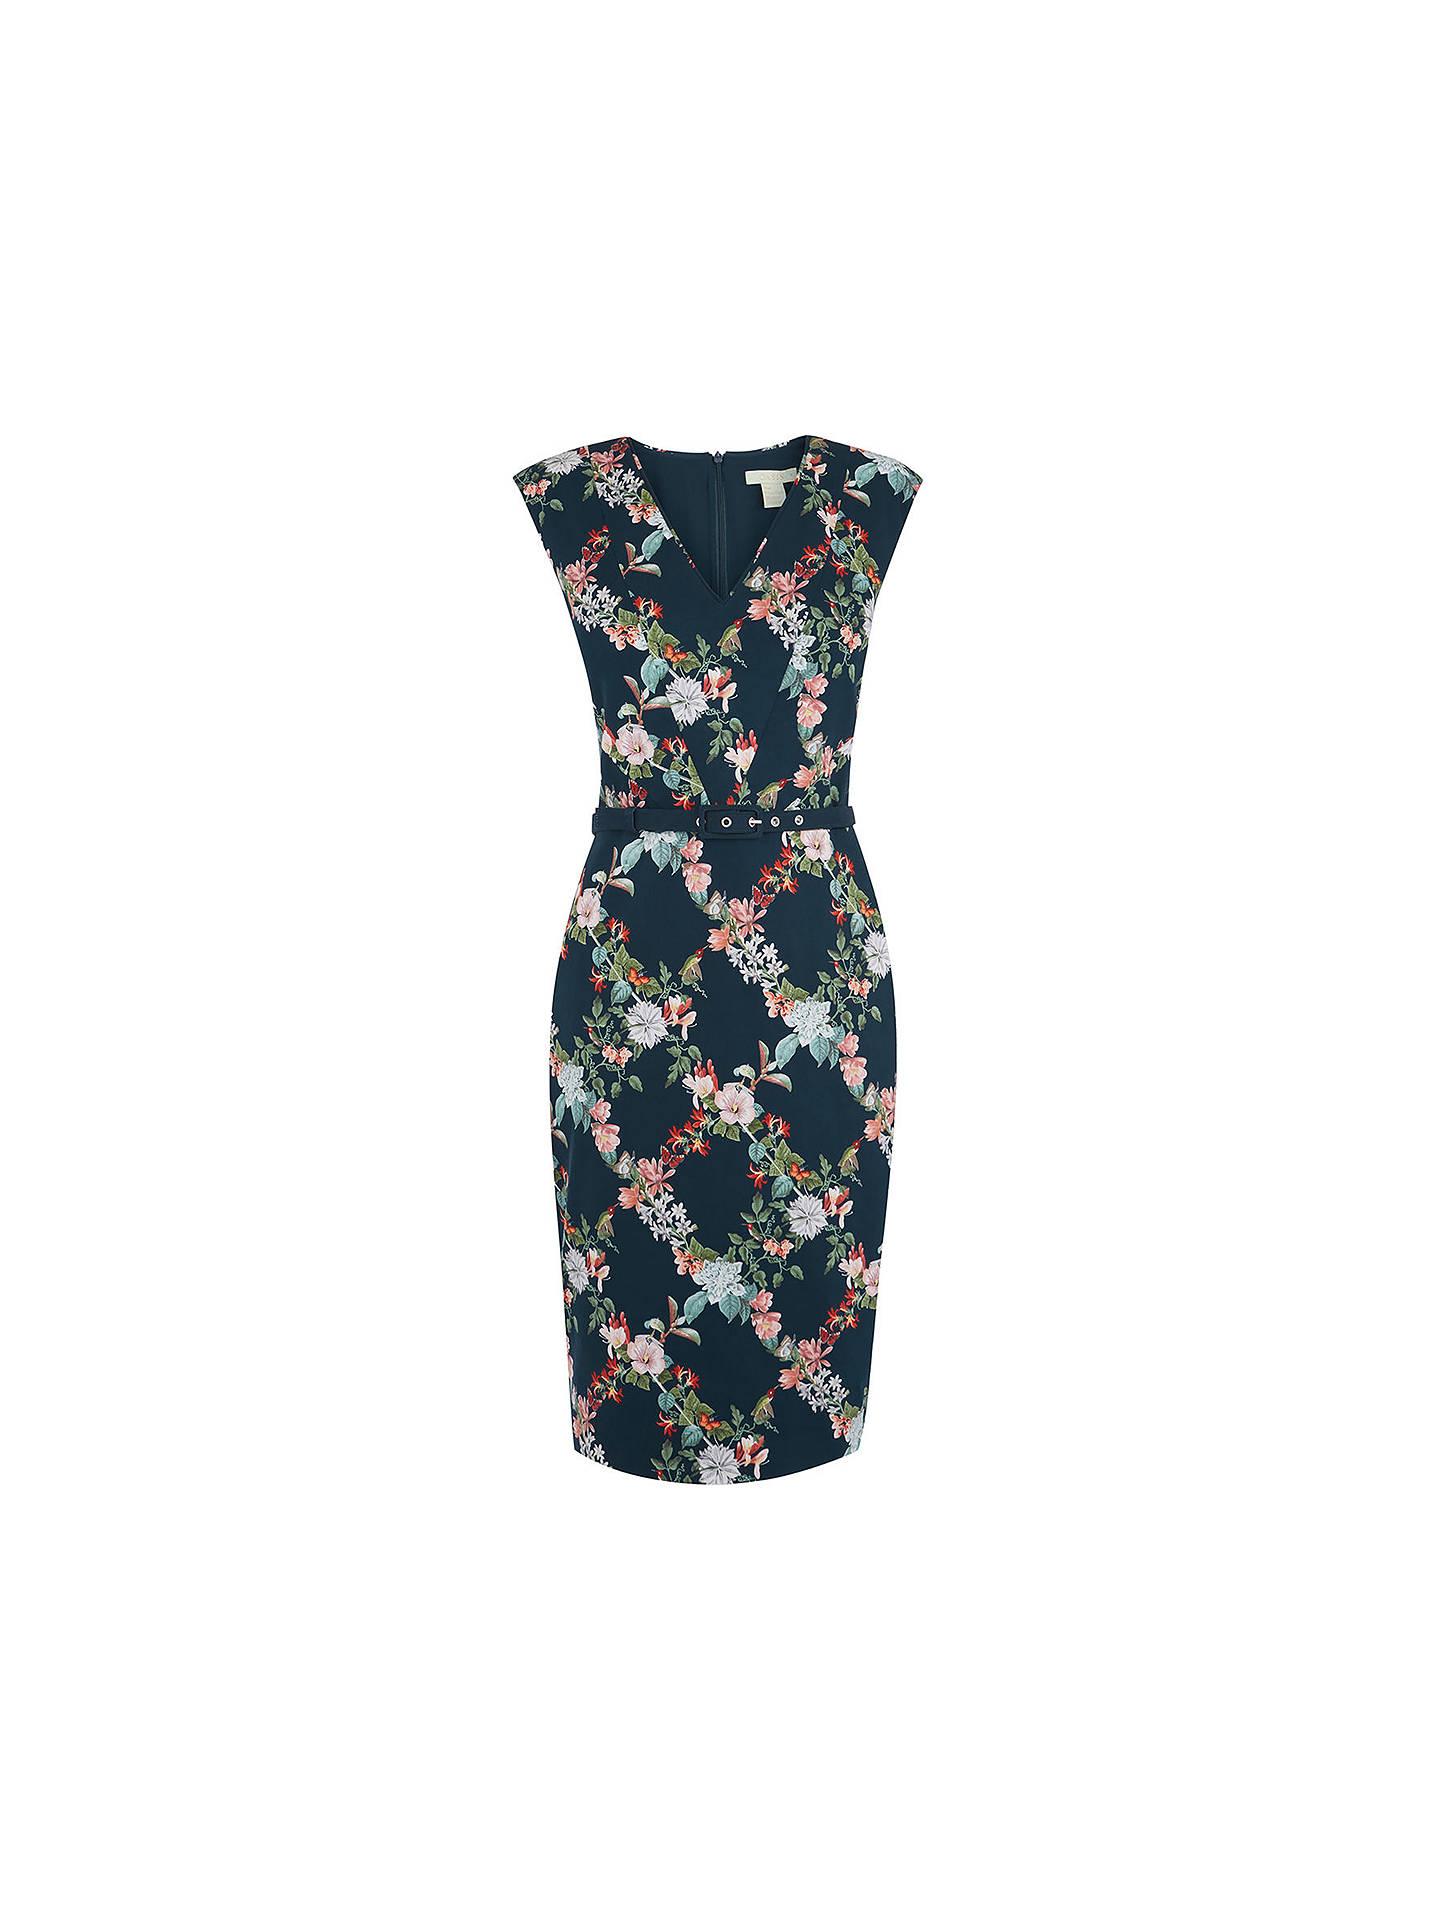 122165748049 ... Buy Oasis Fitzwilliam Floral Pencil Dress, Turquoise, 6 Online at  johnlewis.com ...